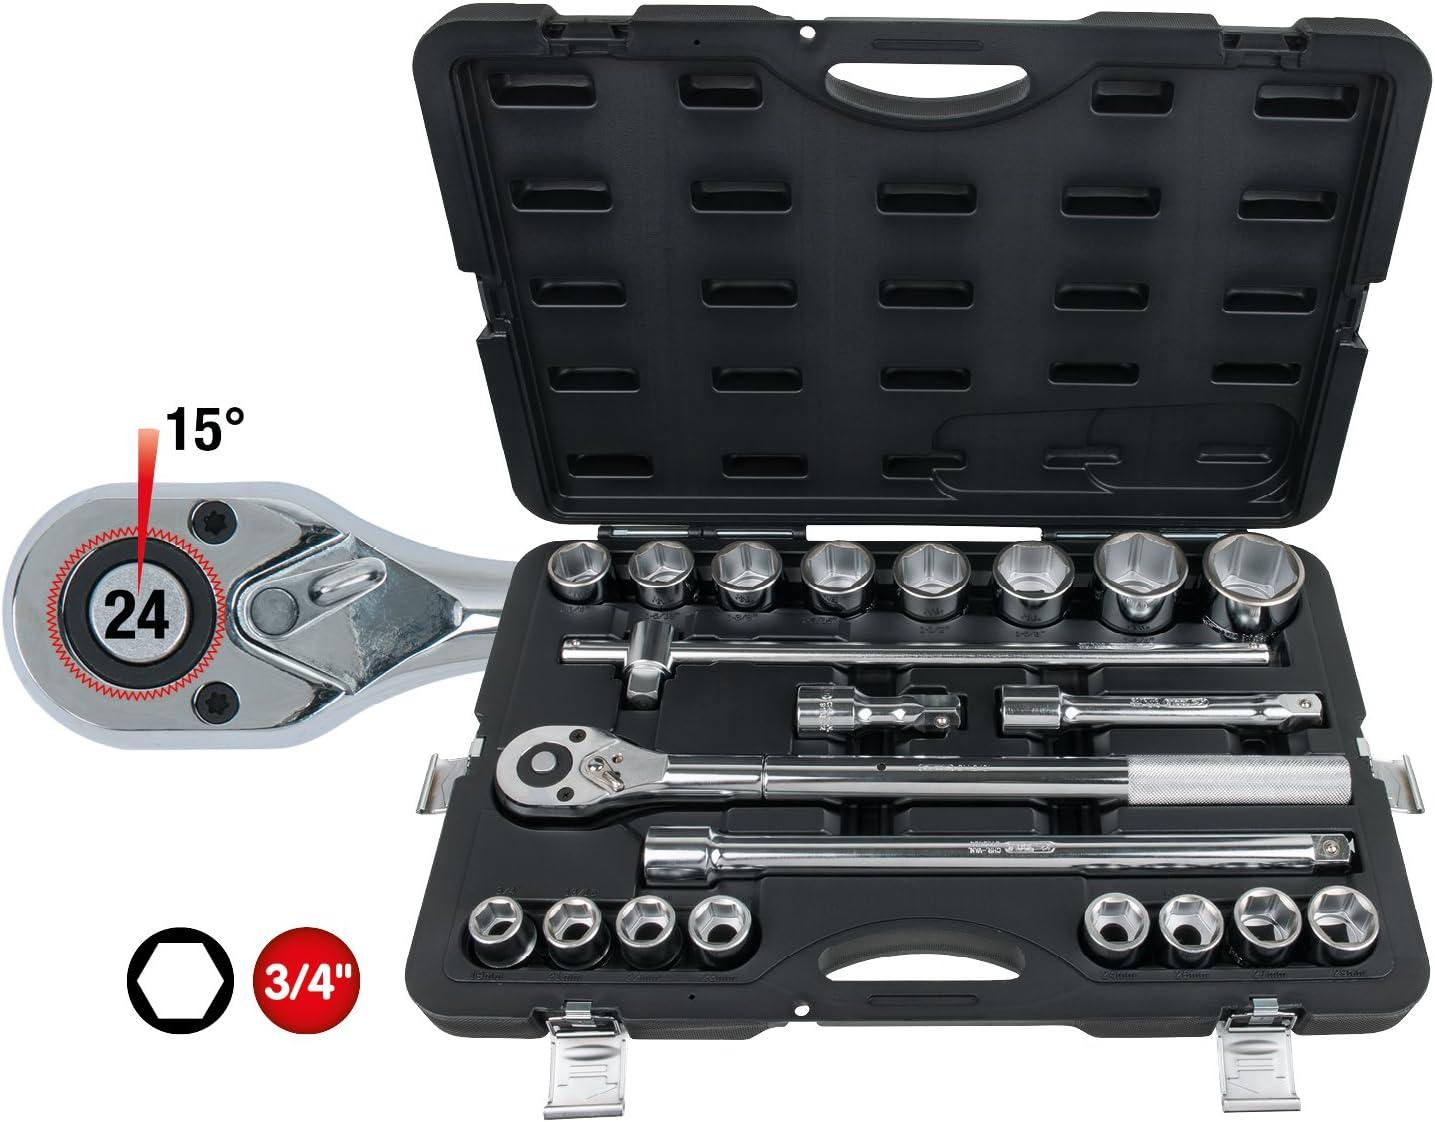 KS Tools 911.0721 3//4 Serie di chiavi a bussola,21pz.metrico